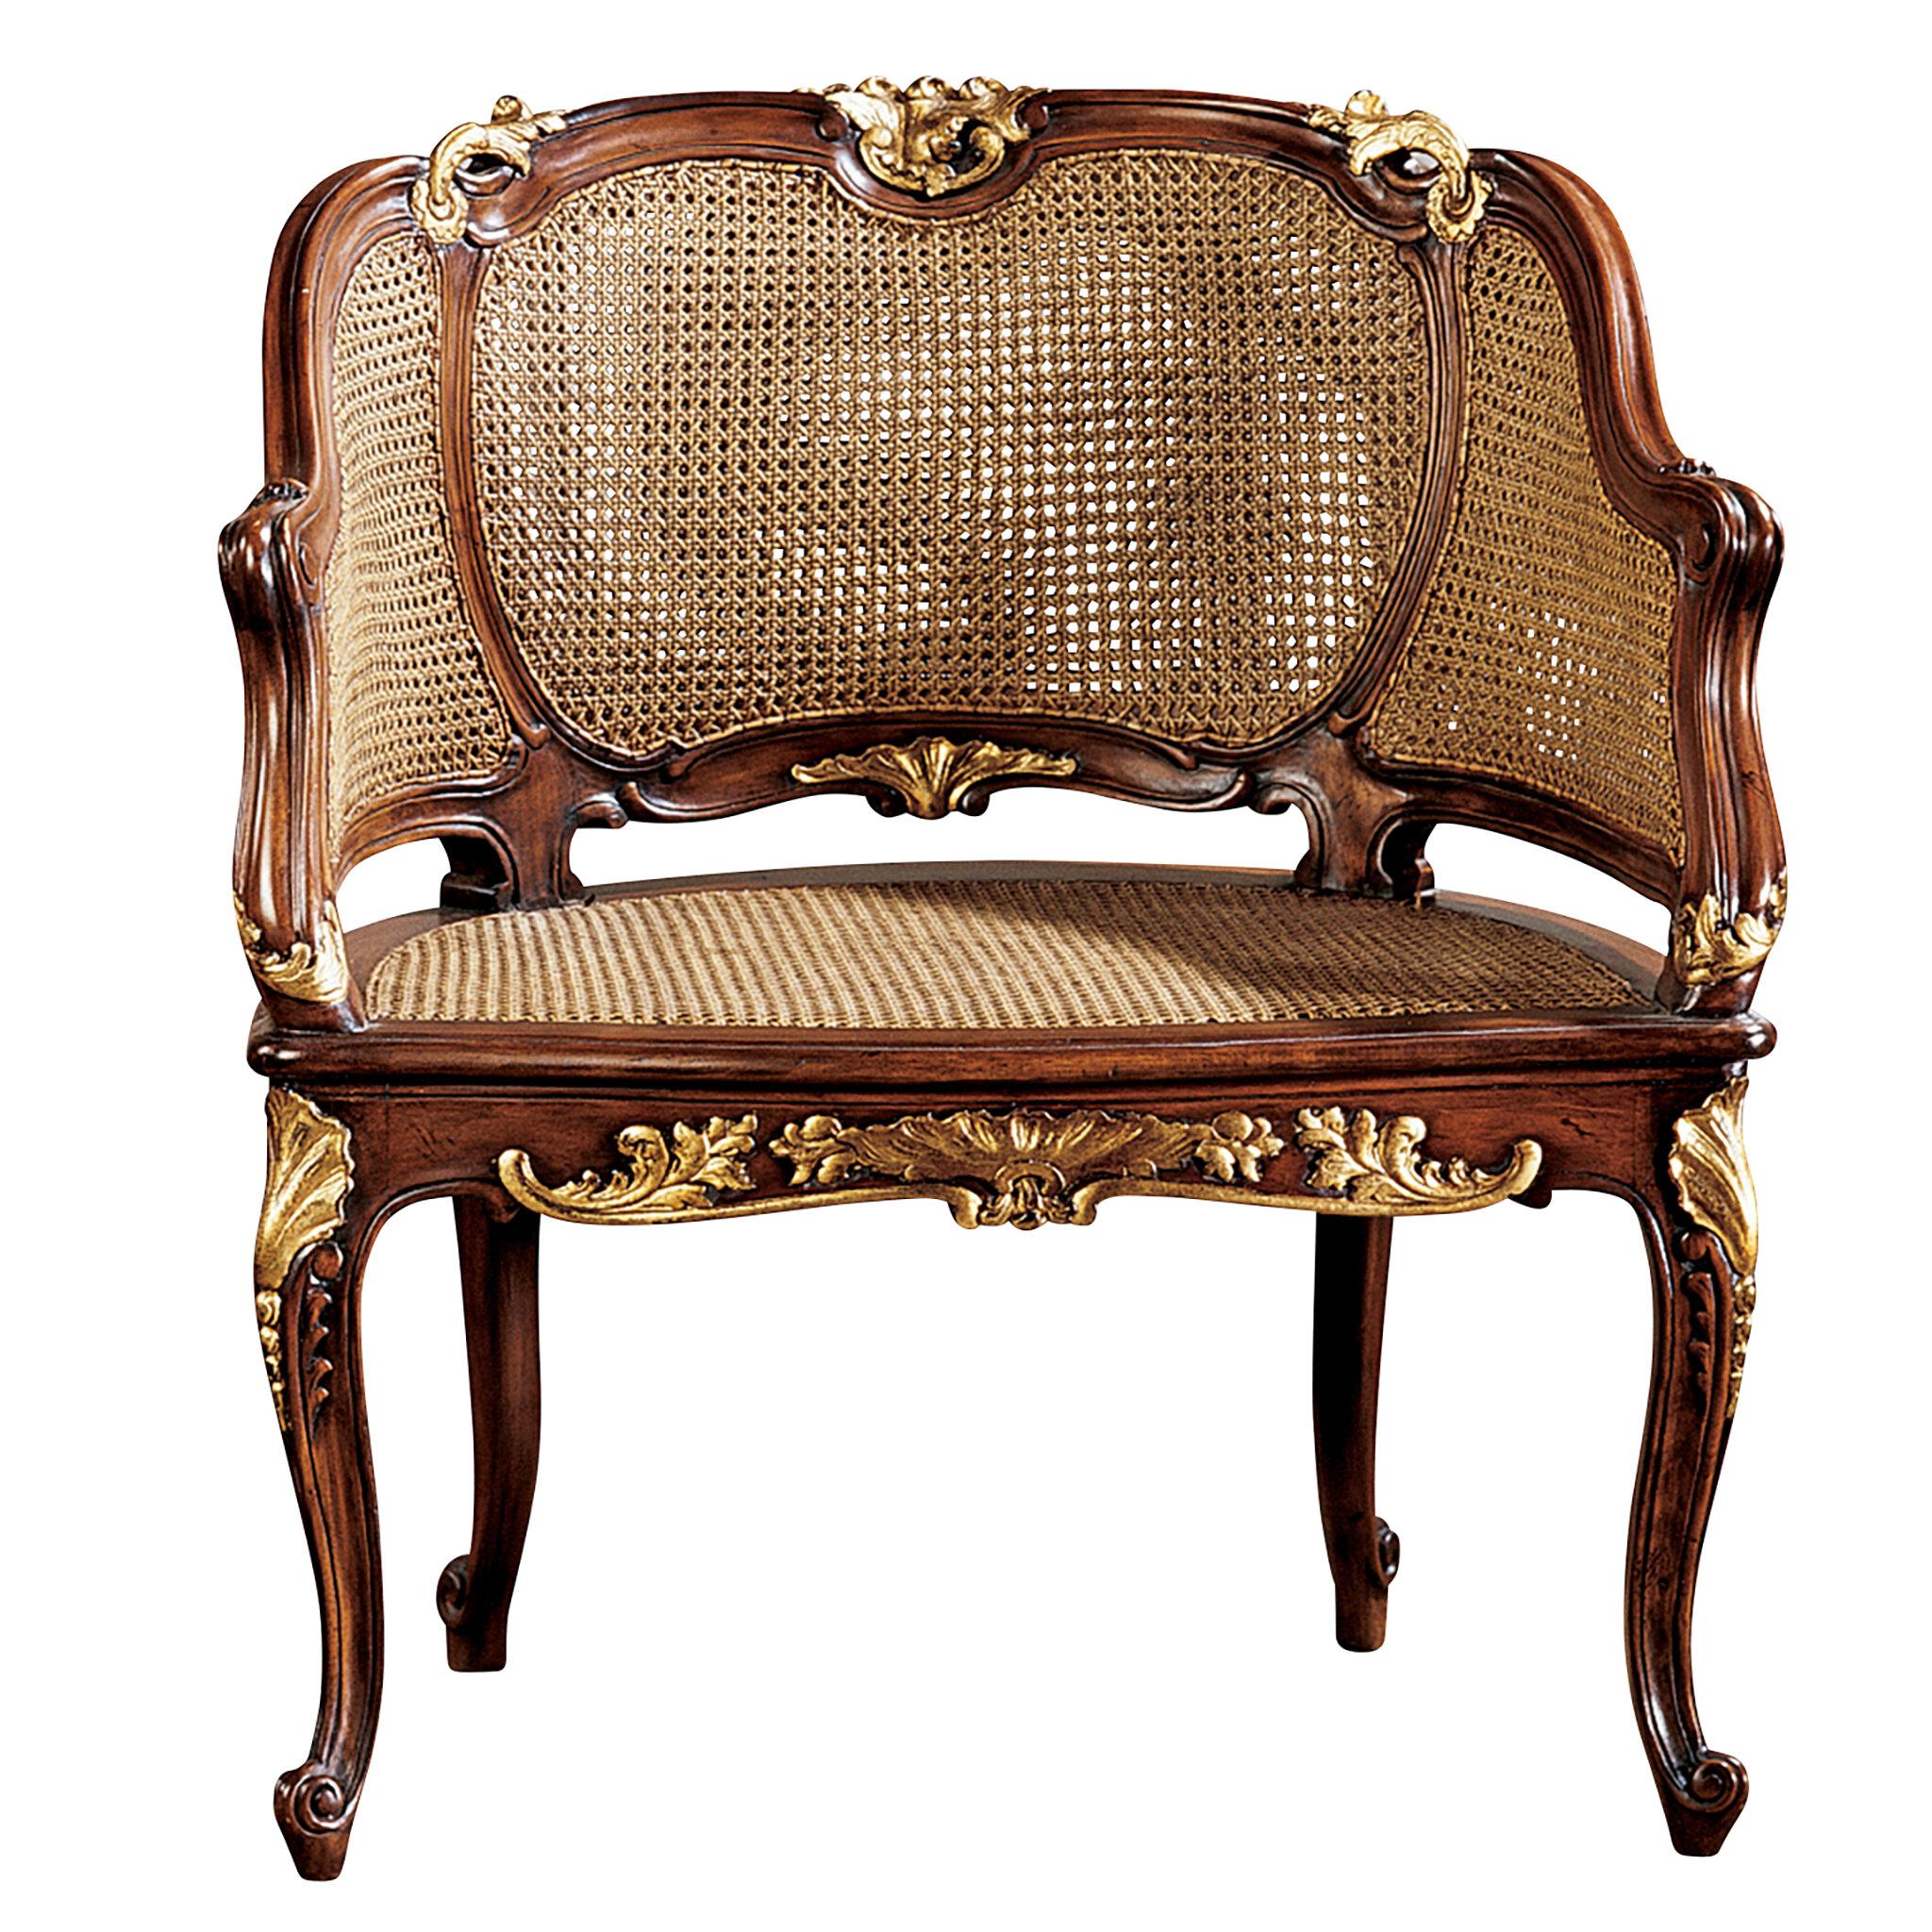 Beau Design Toscano Louis XV French Armchair U0026 Reviews | Wayfair